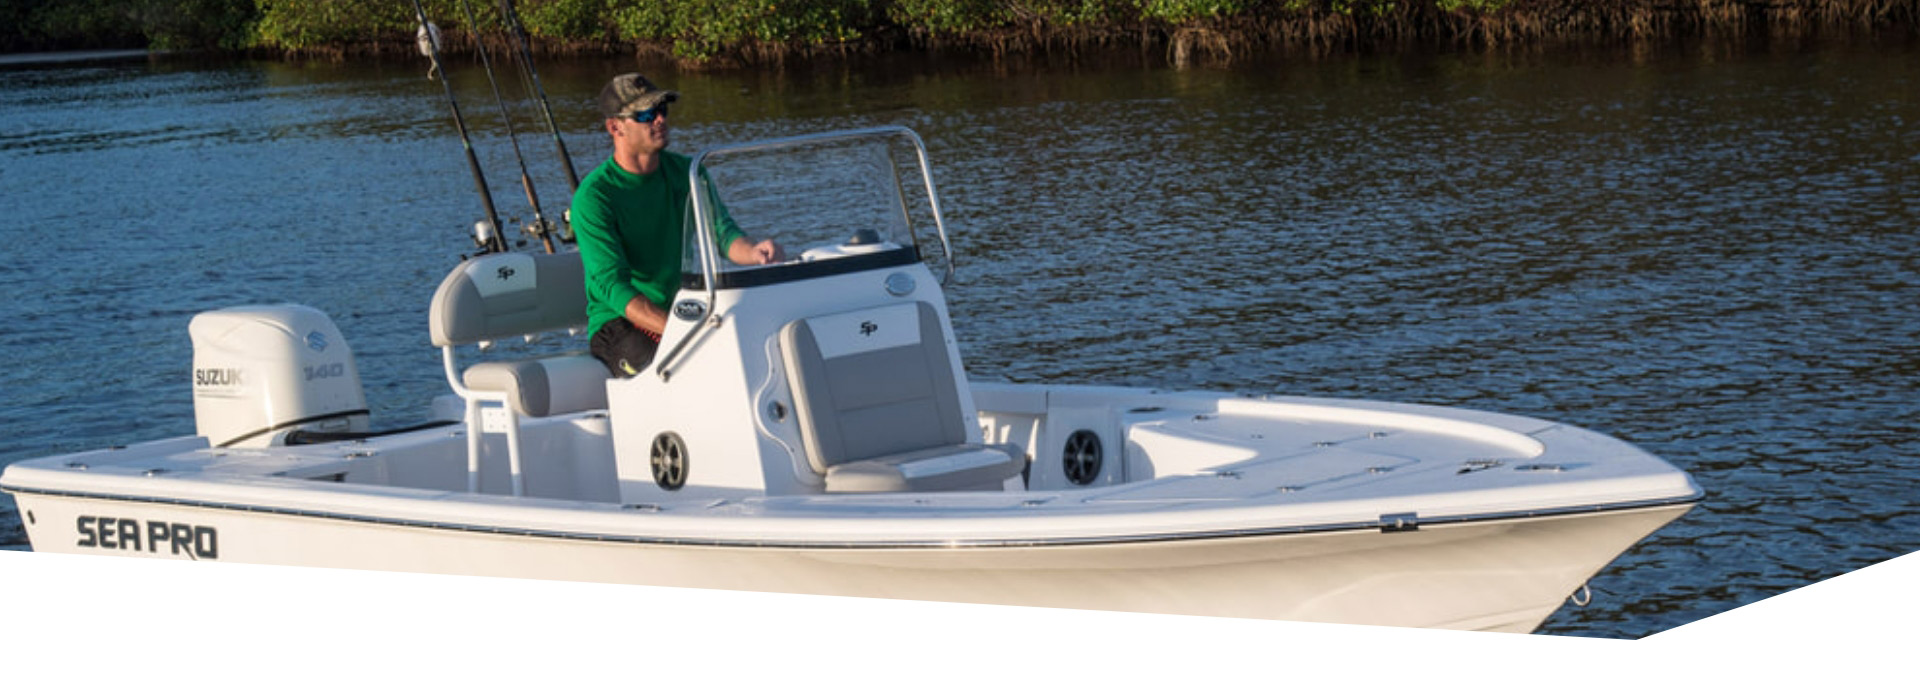 Home Diamond Motors & Marine New Smyrna Beach, FL (386) 424-9000